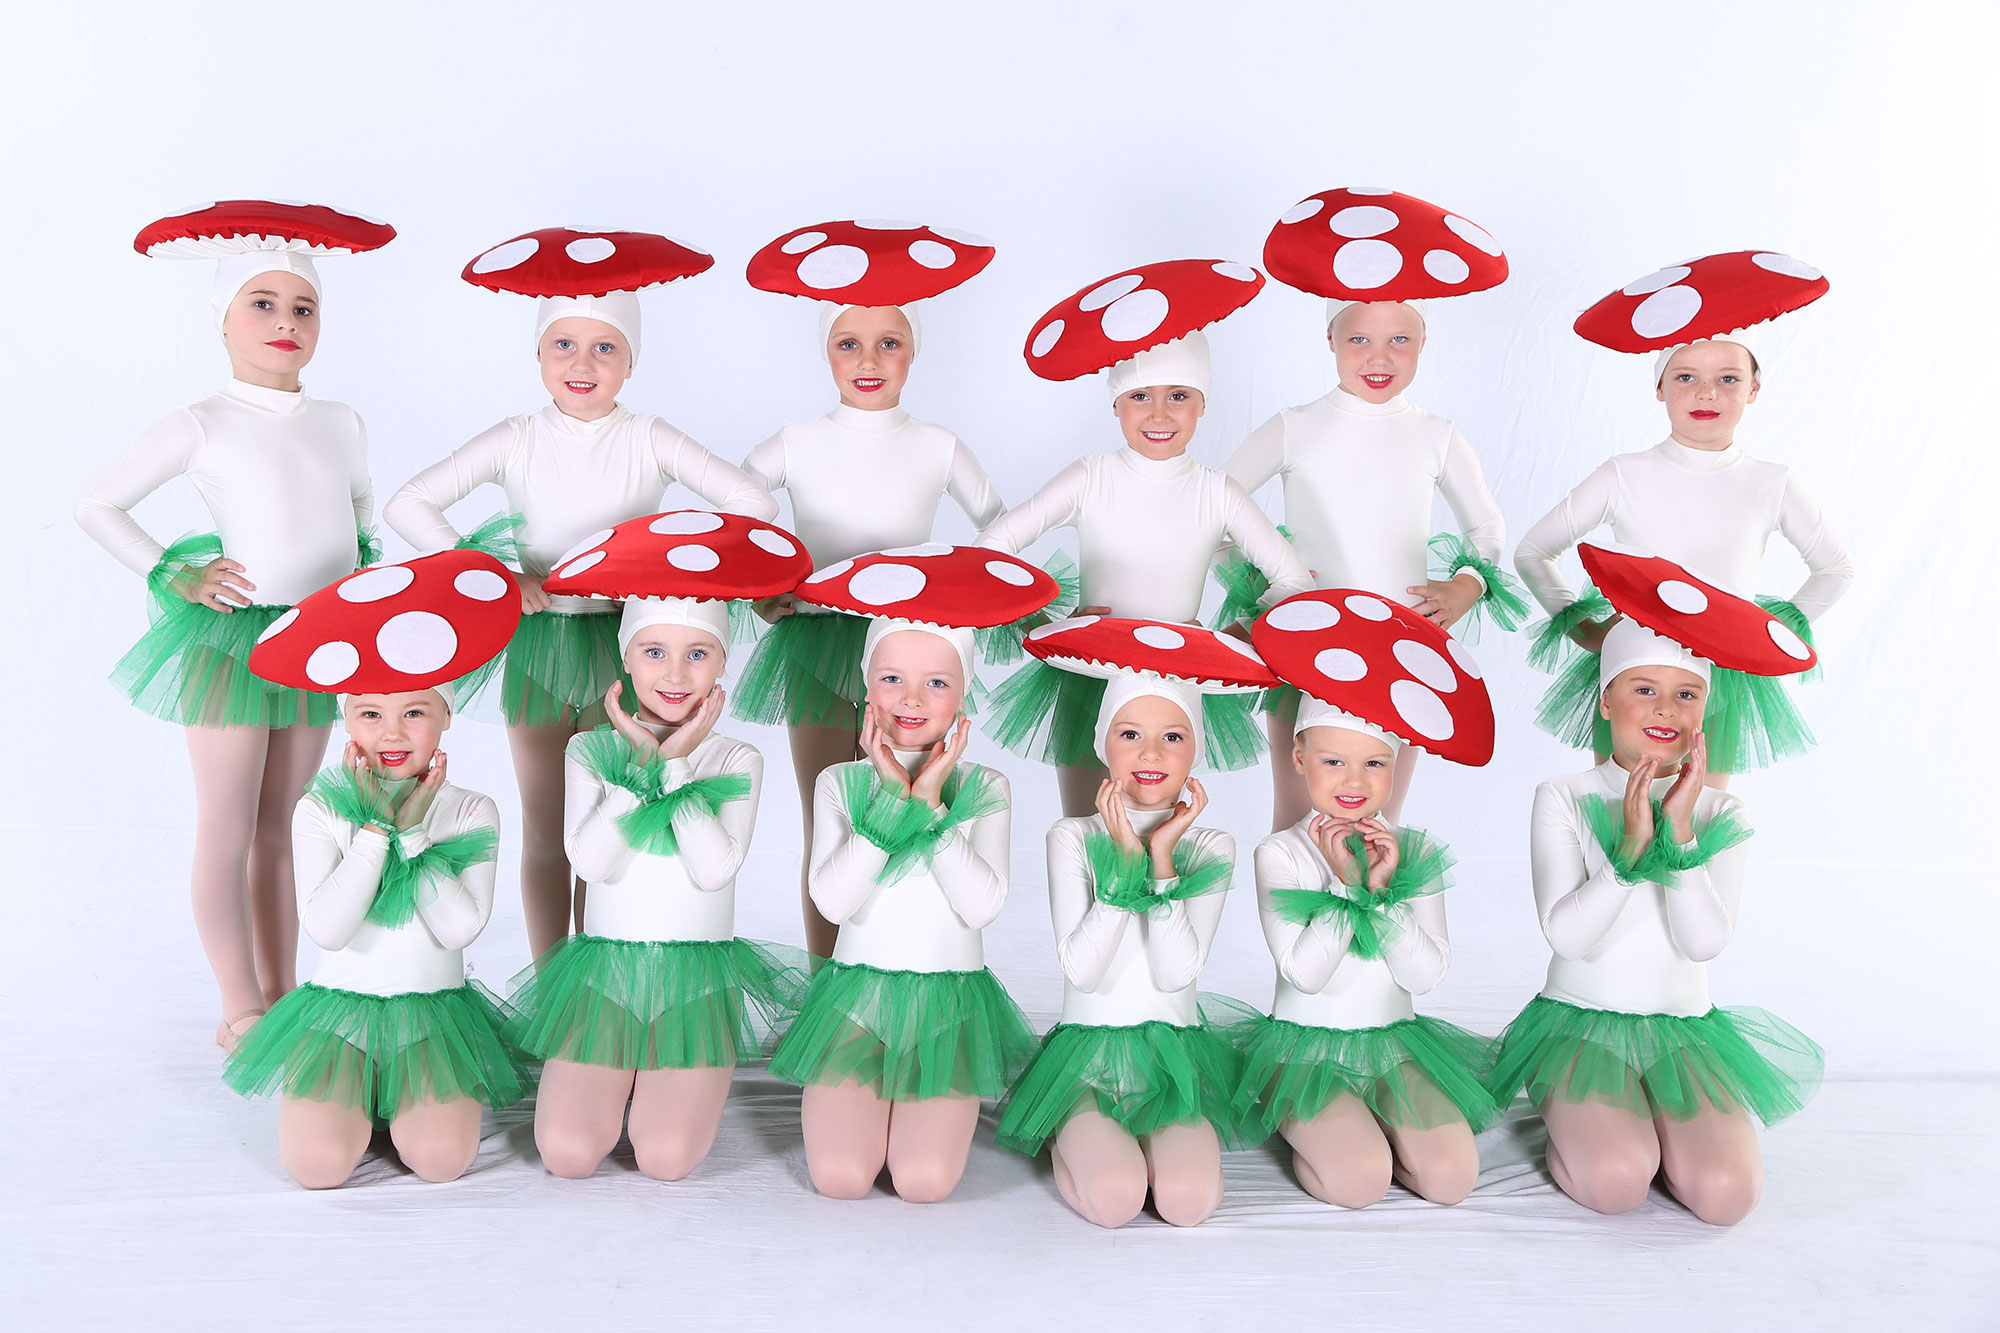 dancers dressed as mushrooms